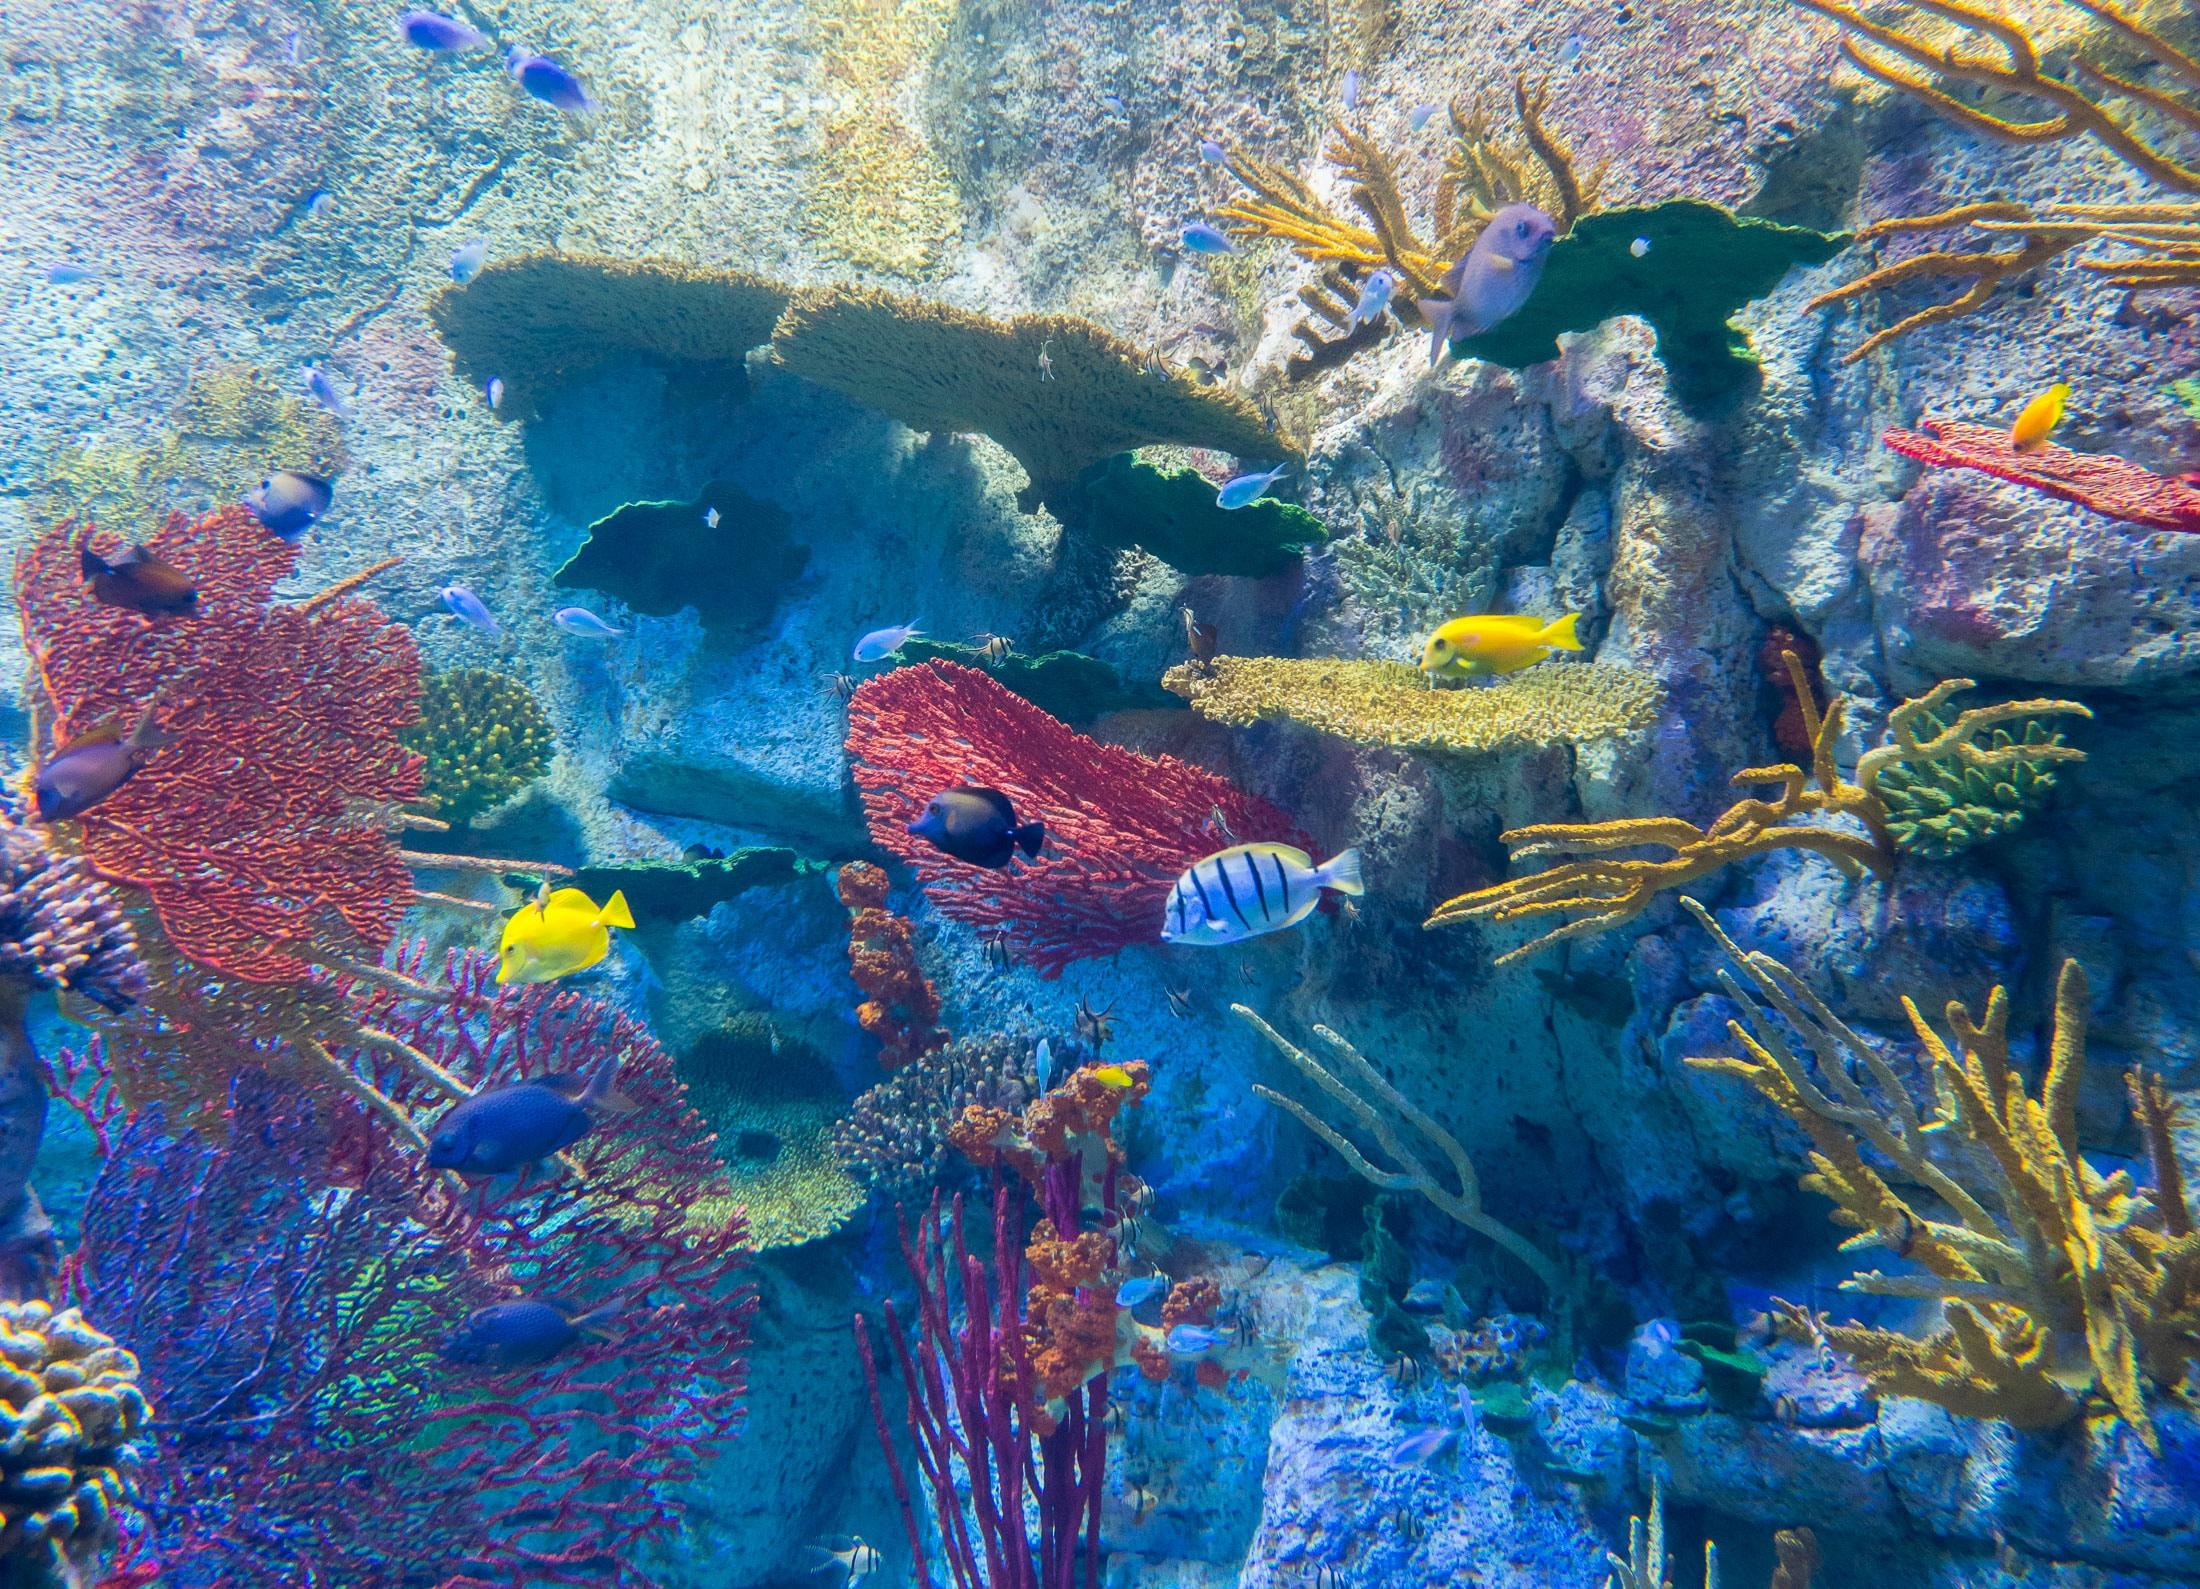 Birch Aquarium San Diego Insider's Guide: Top Exhibits ...